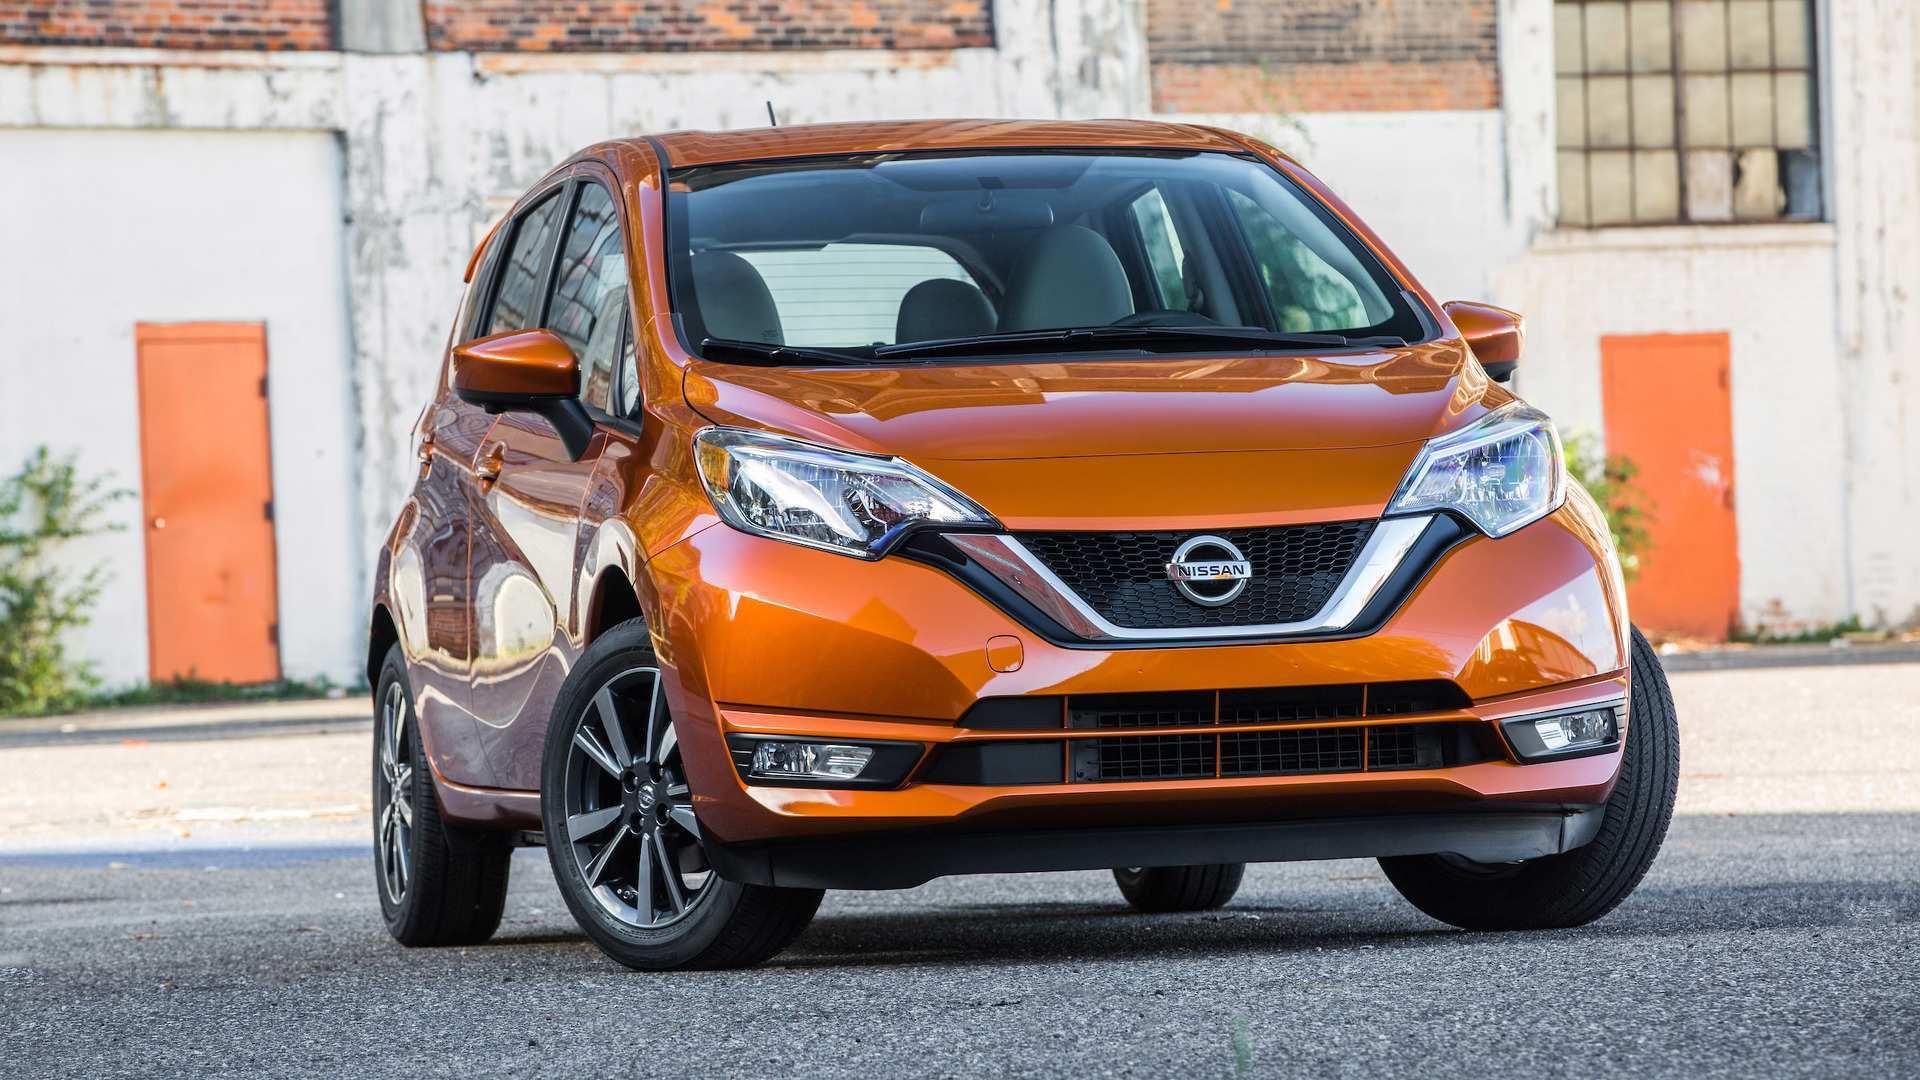 66 Concept of Nissan Versa 2020 Brasil Speed Test for Nissan Versa 2020 Brasil